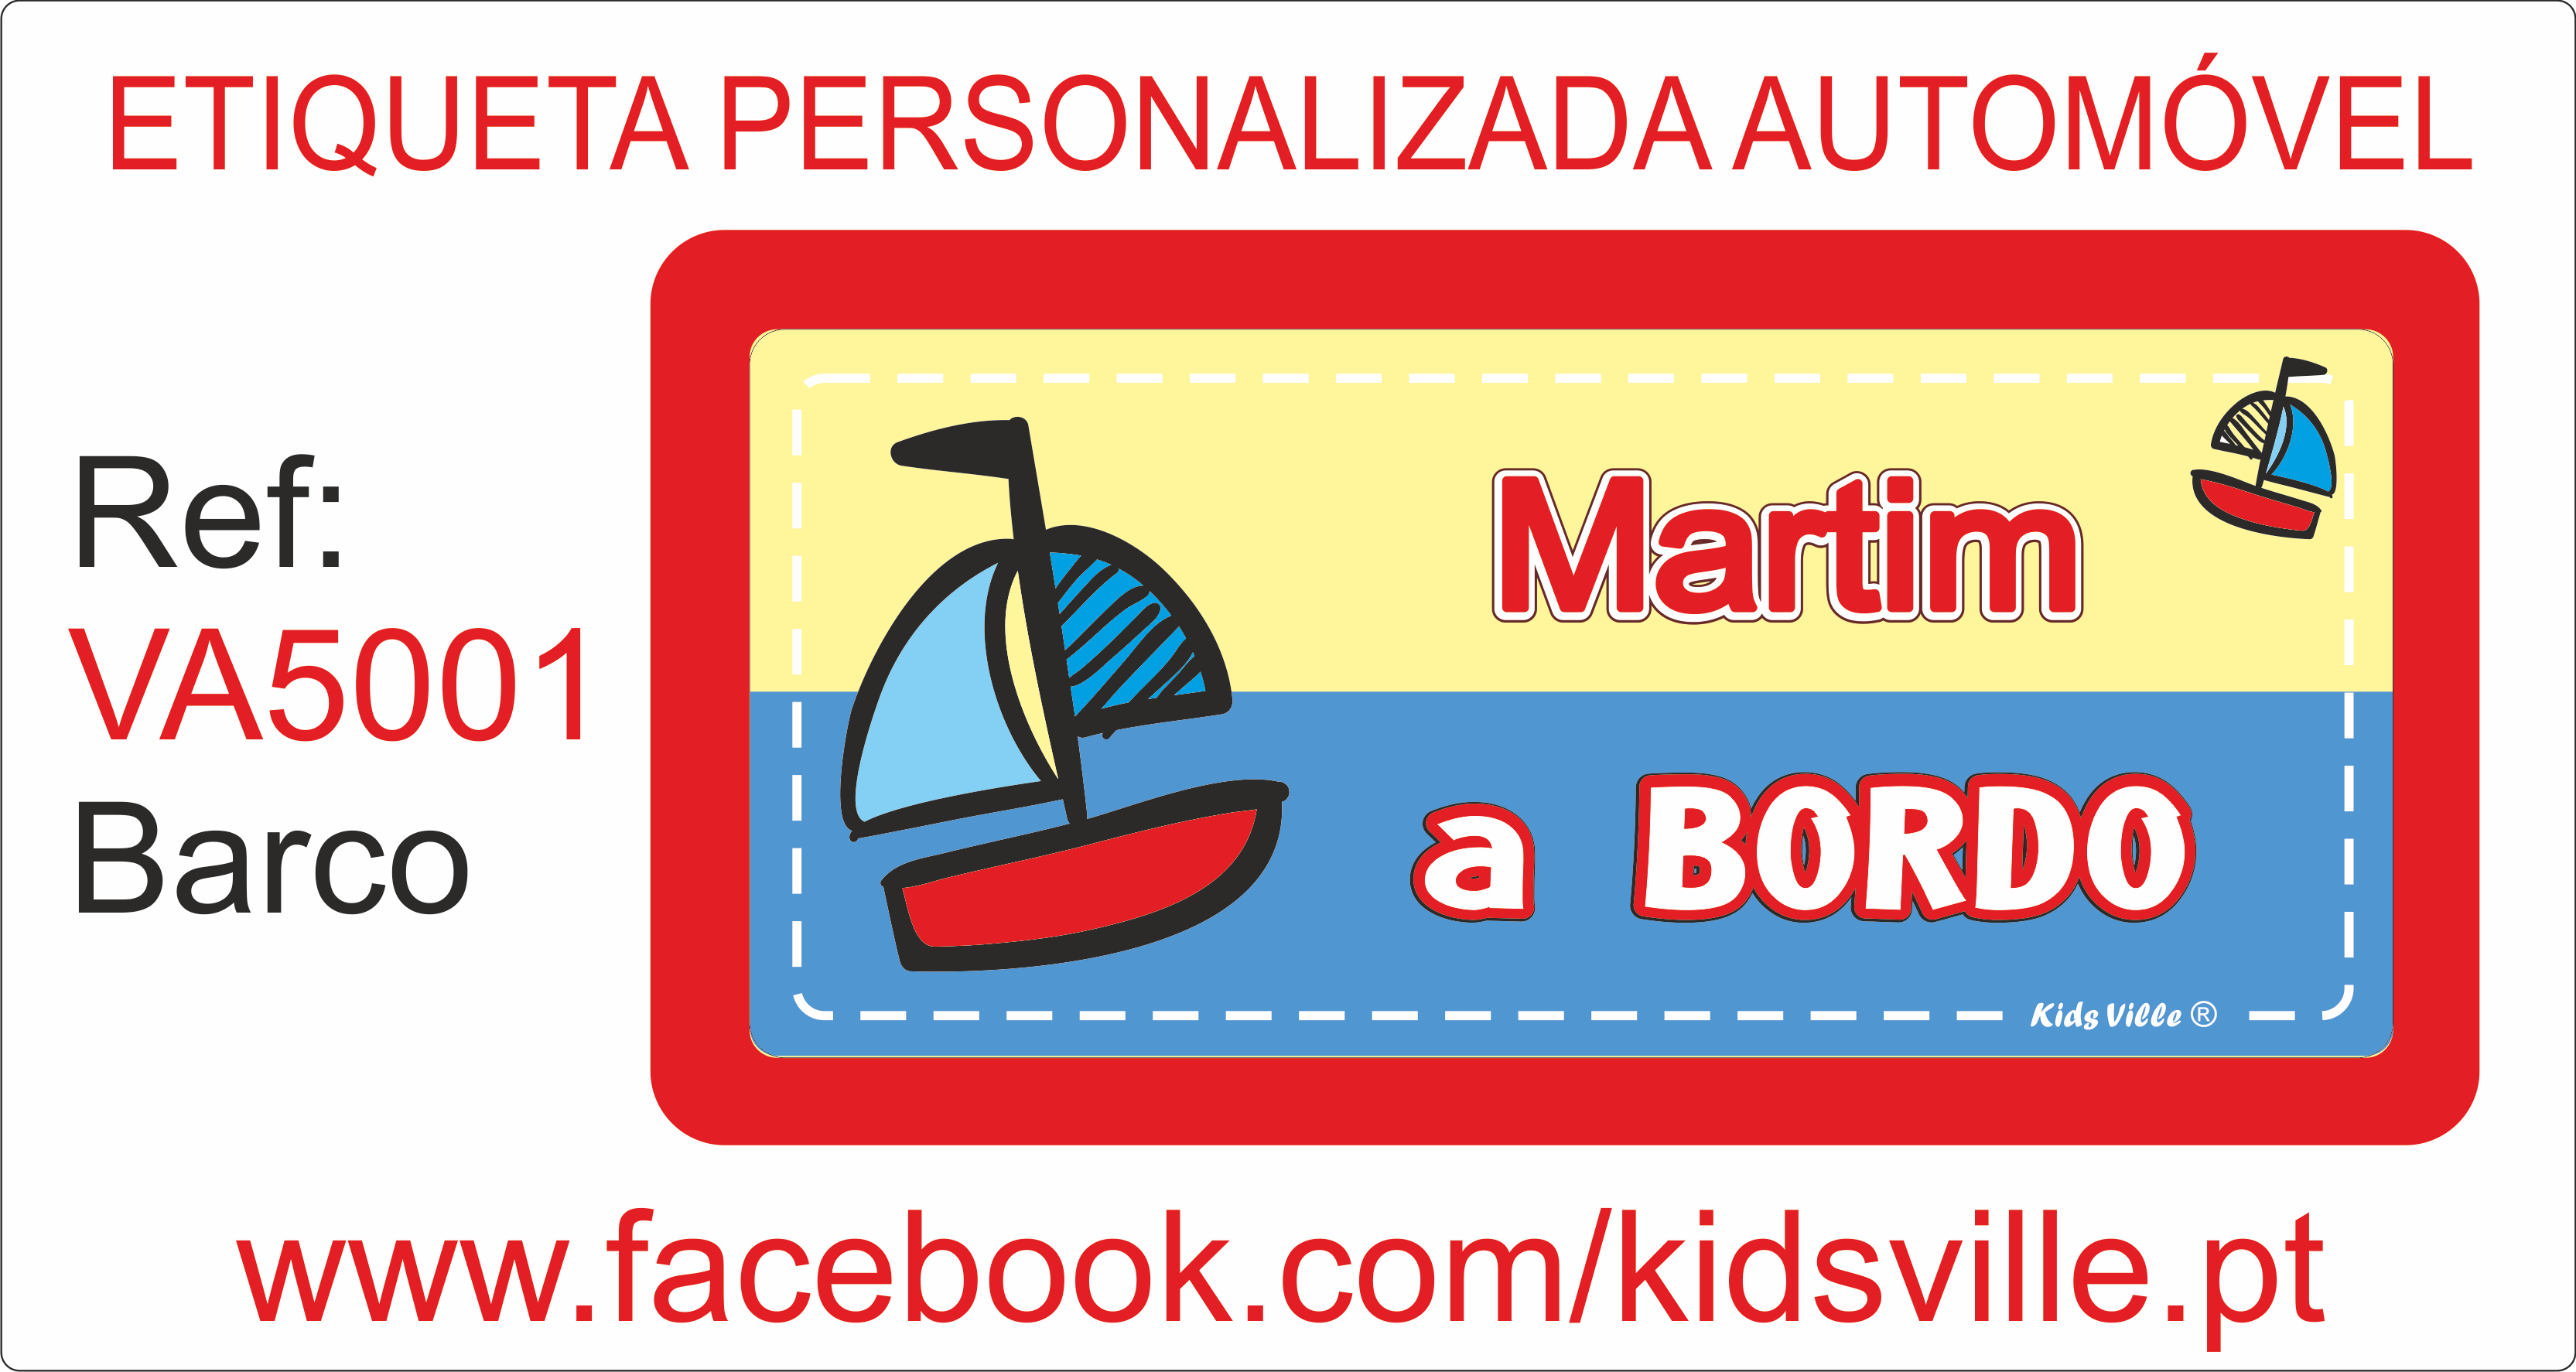 Etiquetas Automóvel Ref: VA5001 Barco Preço: 8,00€